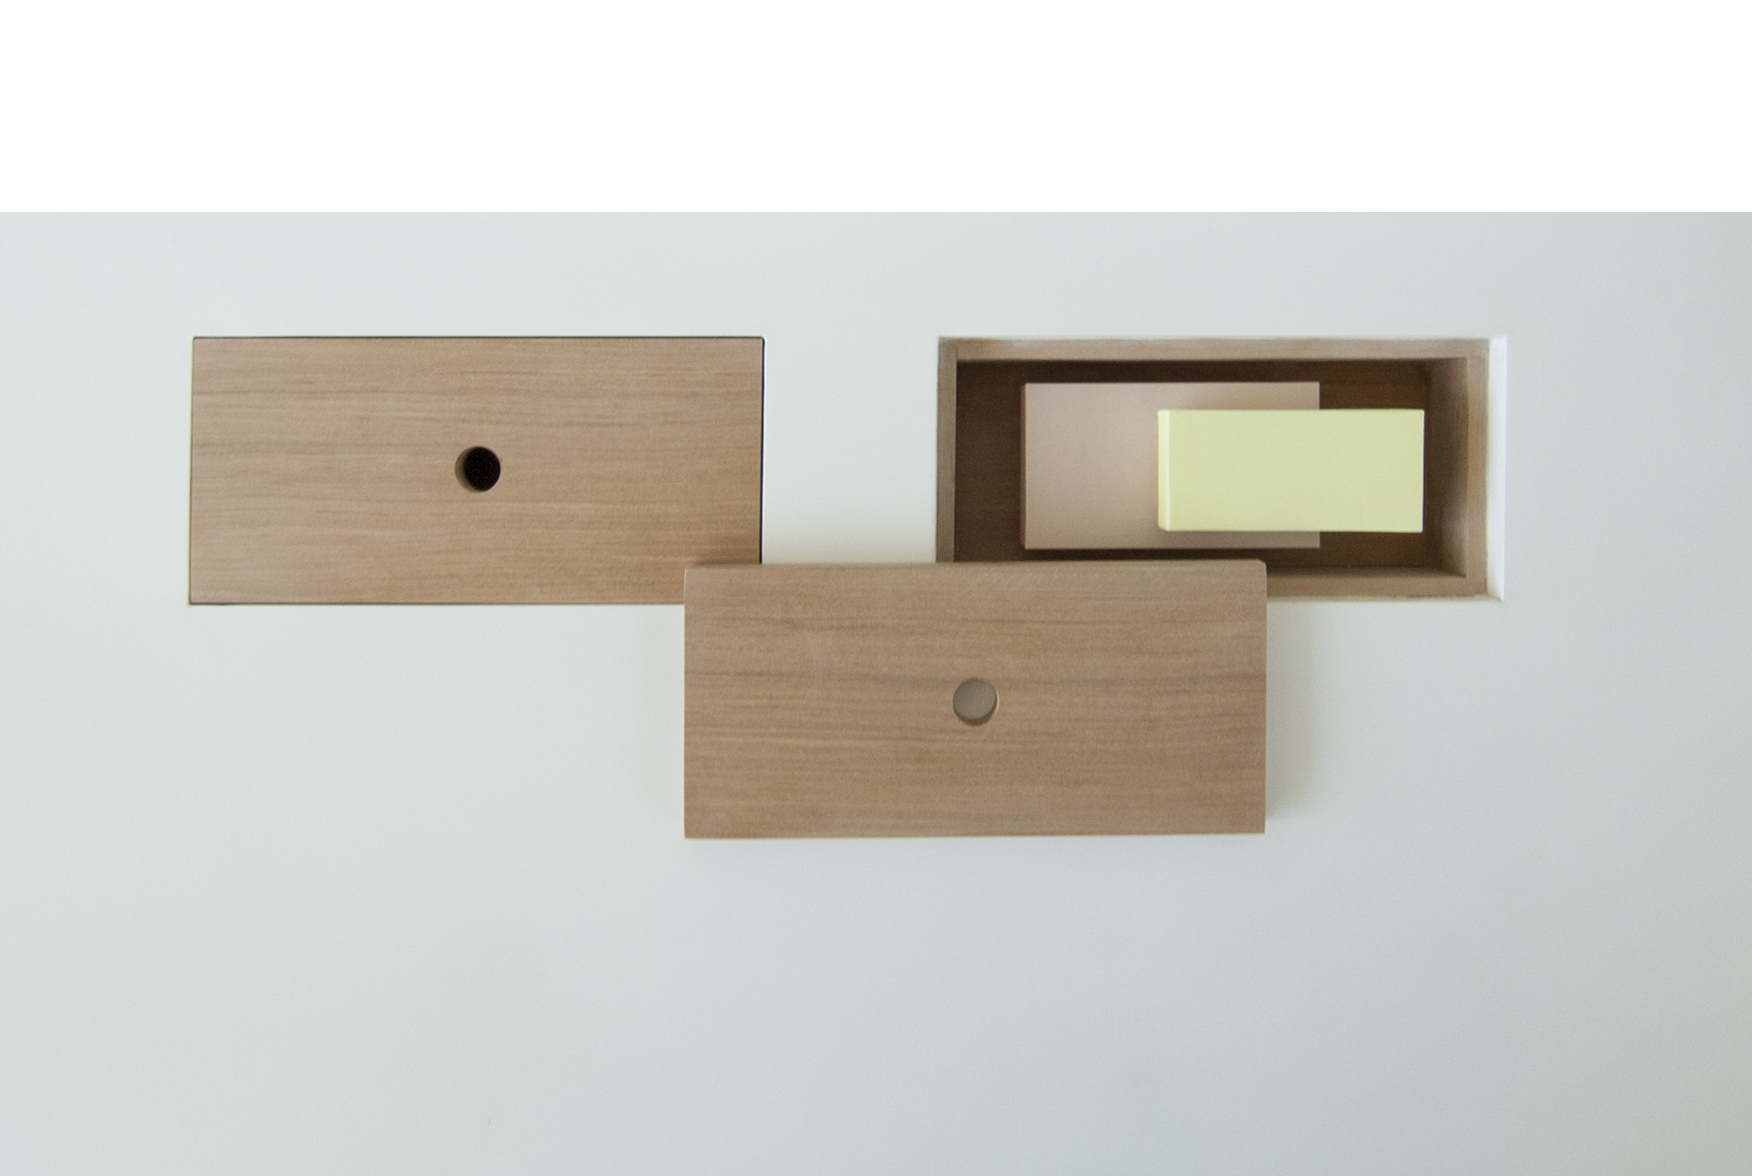 Cajoncitos flotantes ocultos en madera al natural.  15cms W x 35cms L x 10cms H